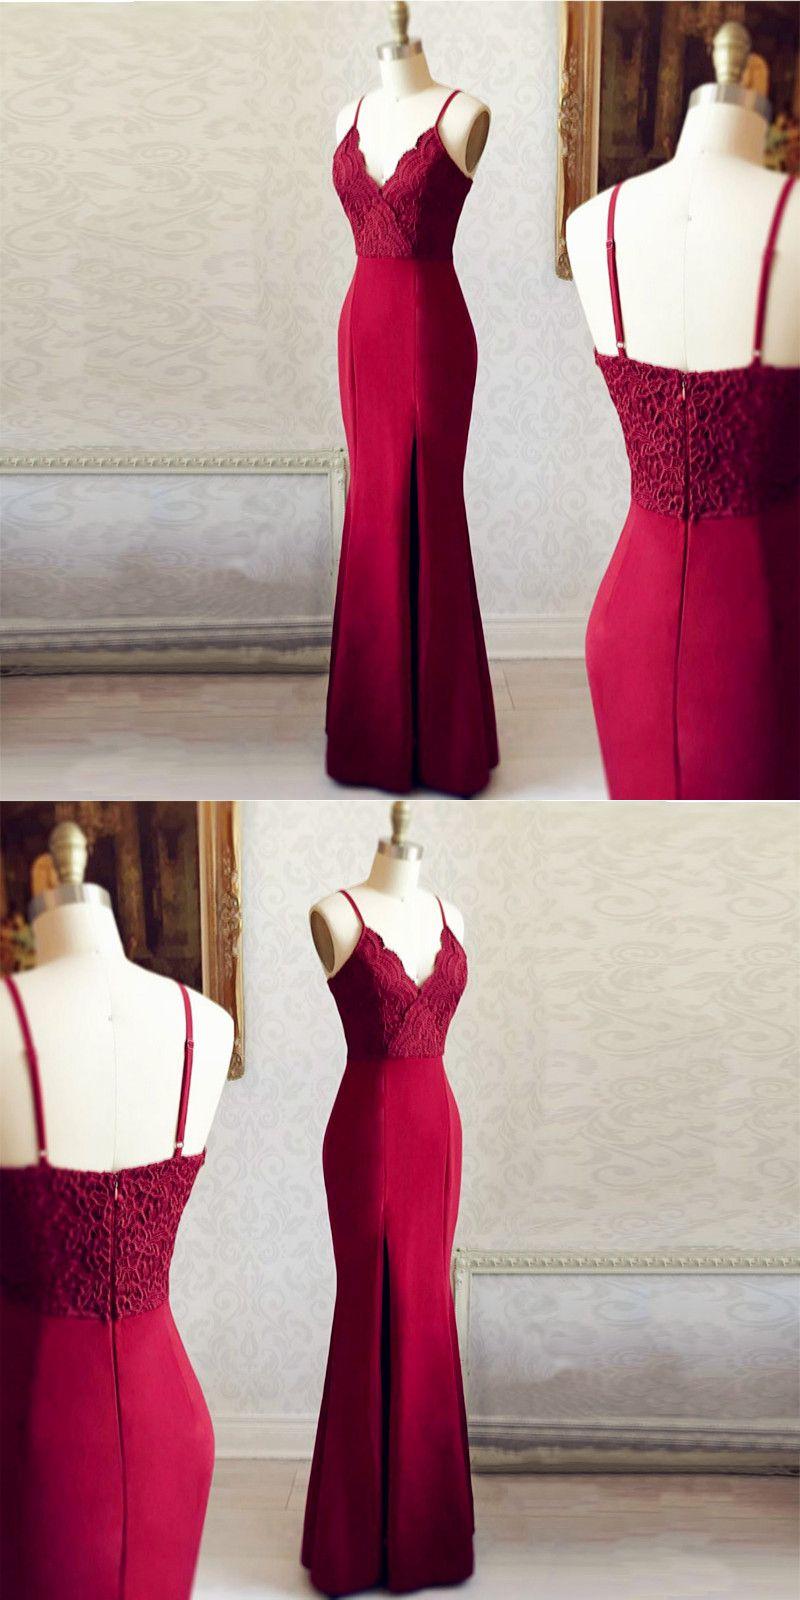 Mermaid Spaghetti Straps Side Slit Burgundy Long Prom Dress with